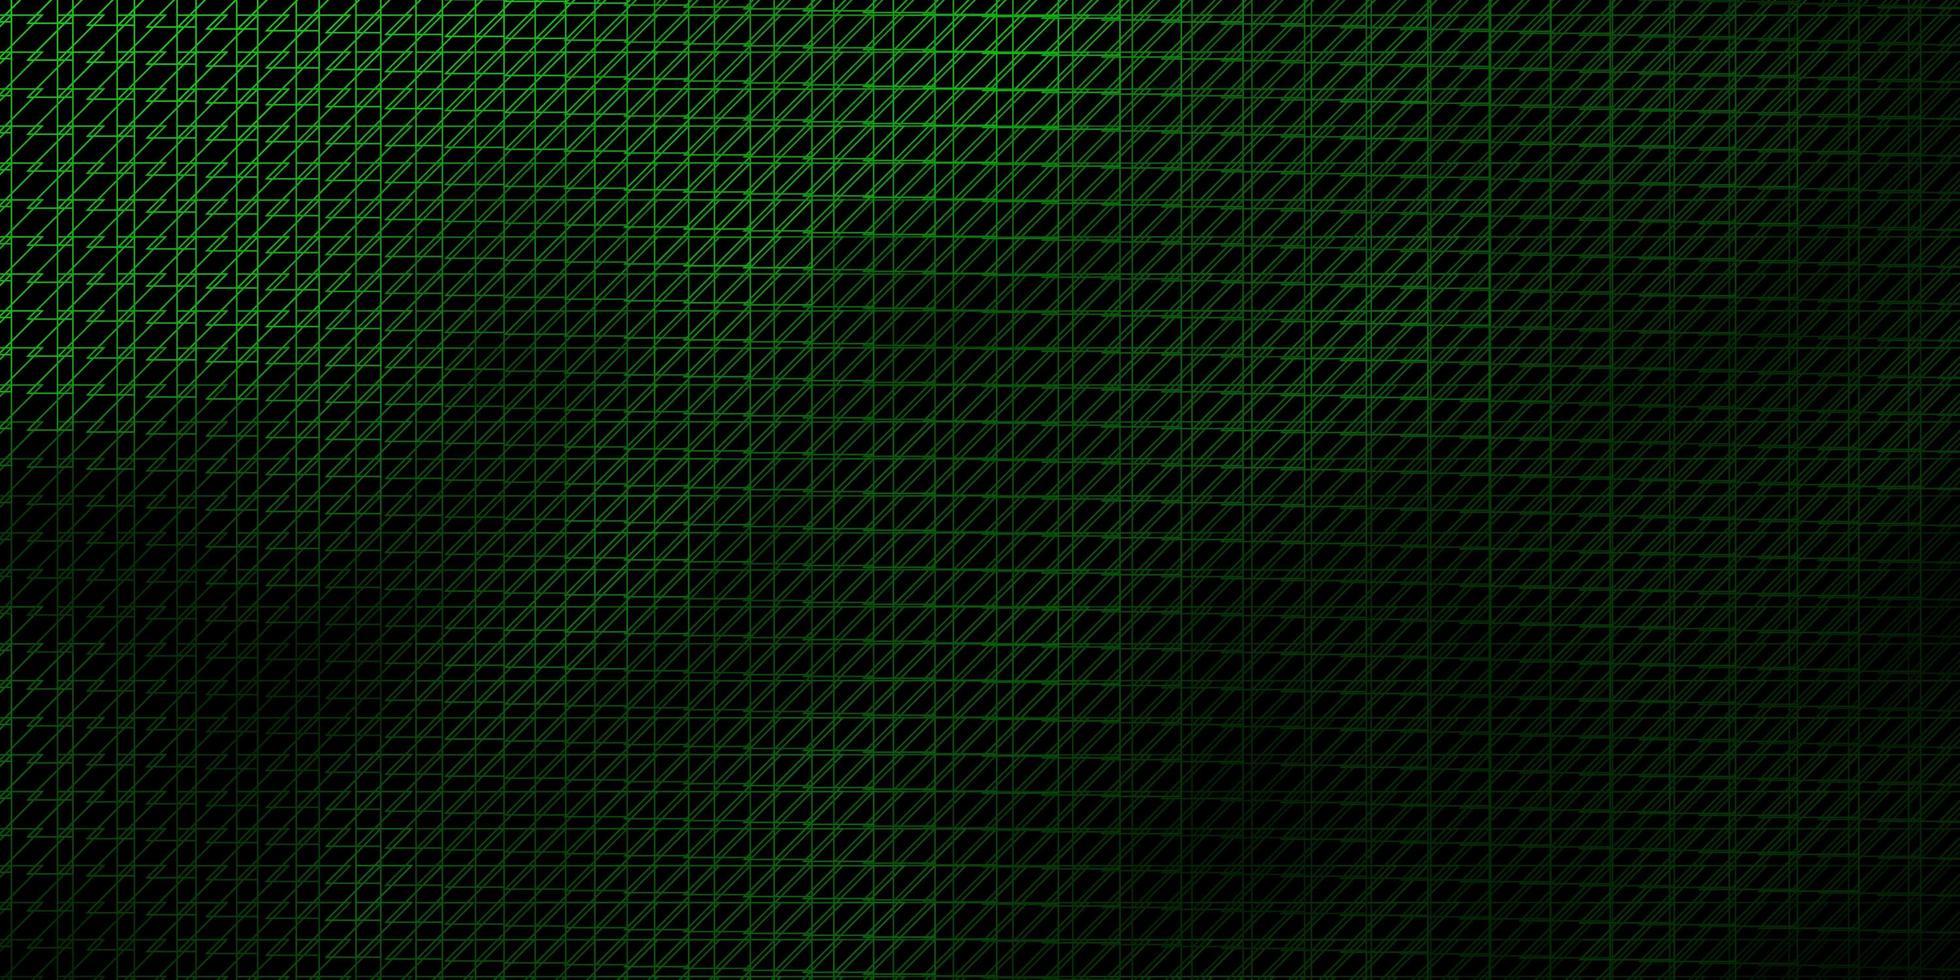 Dark Green vector backdrop with lines.